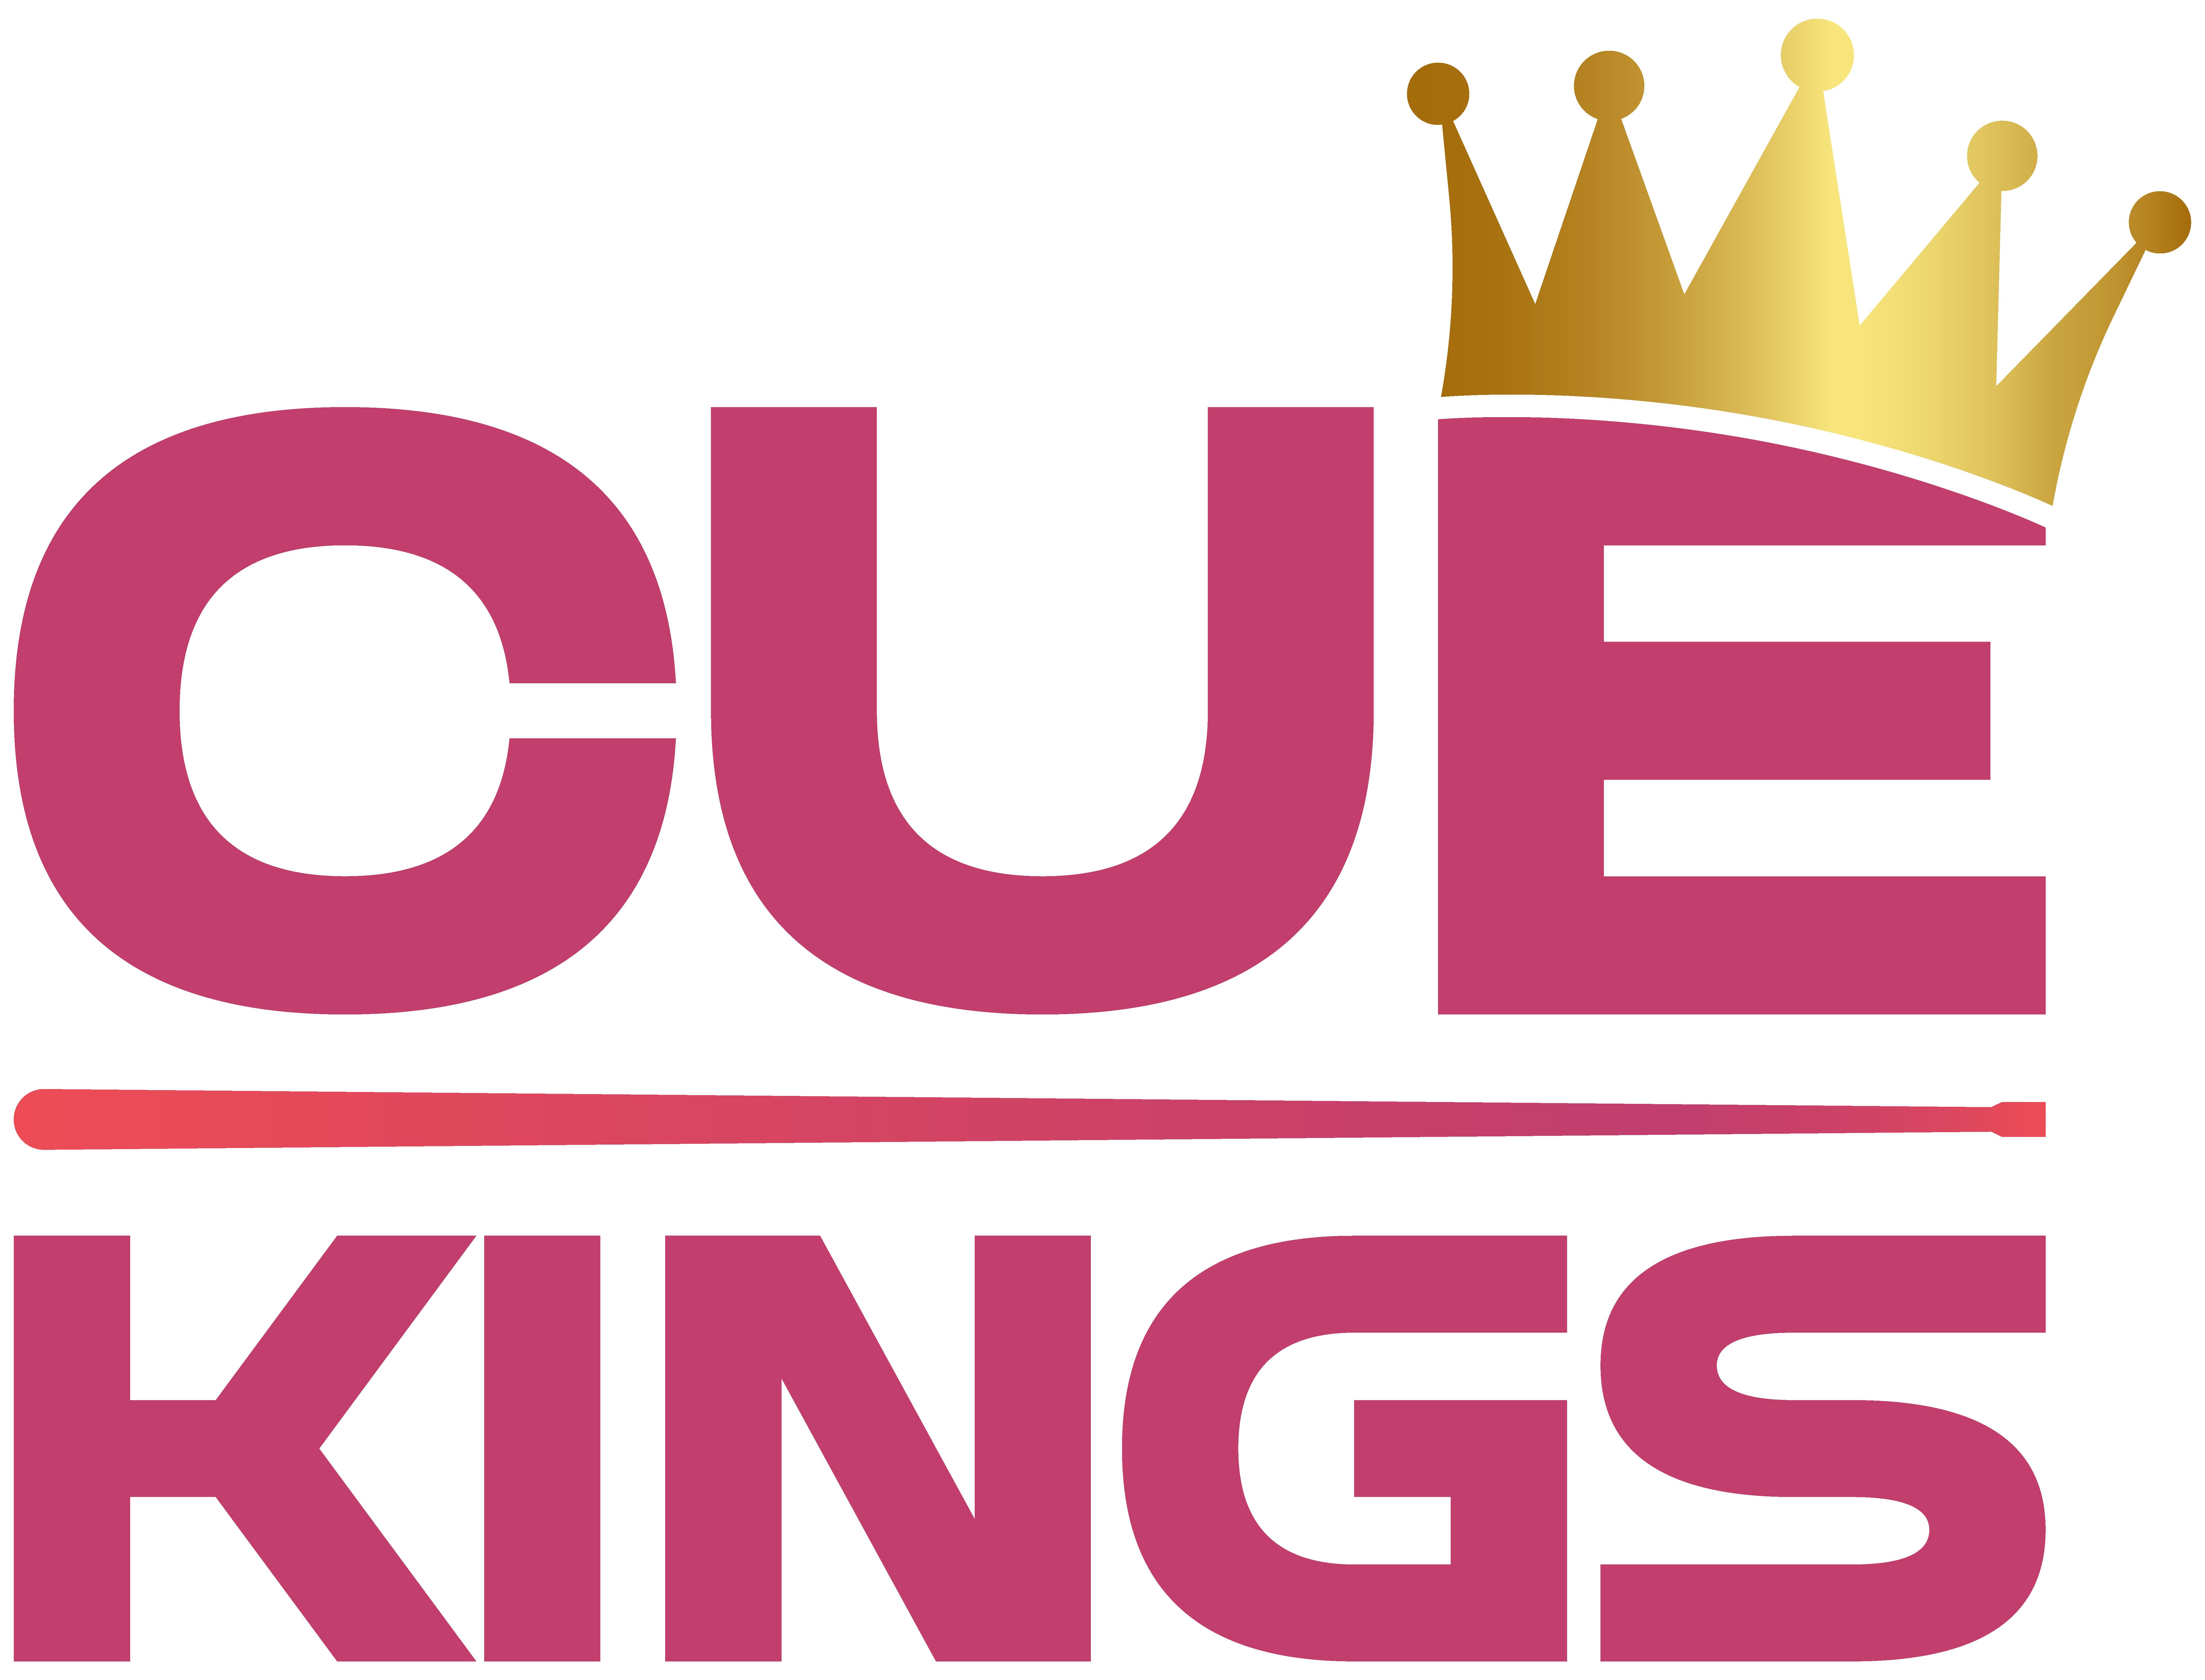 CueKings